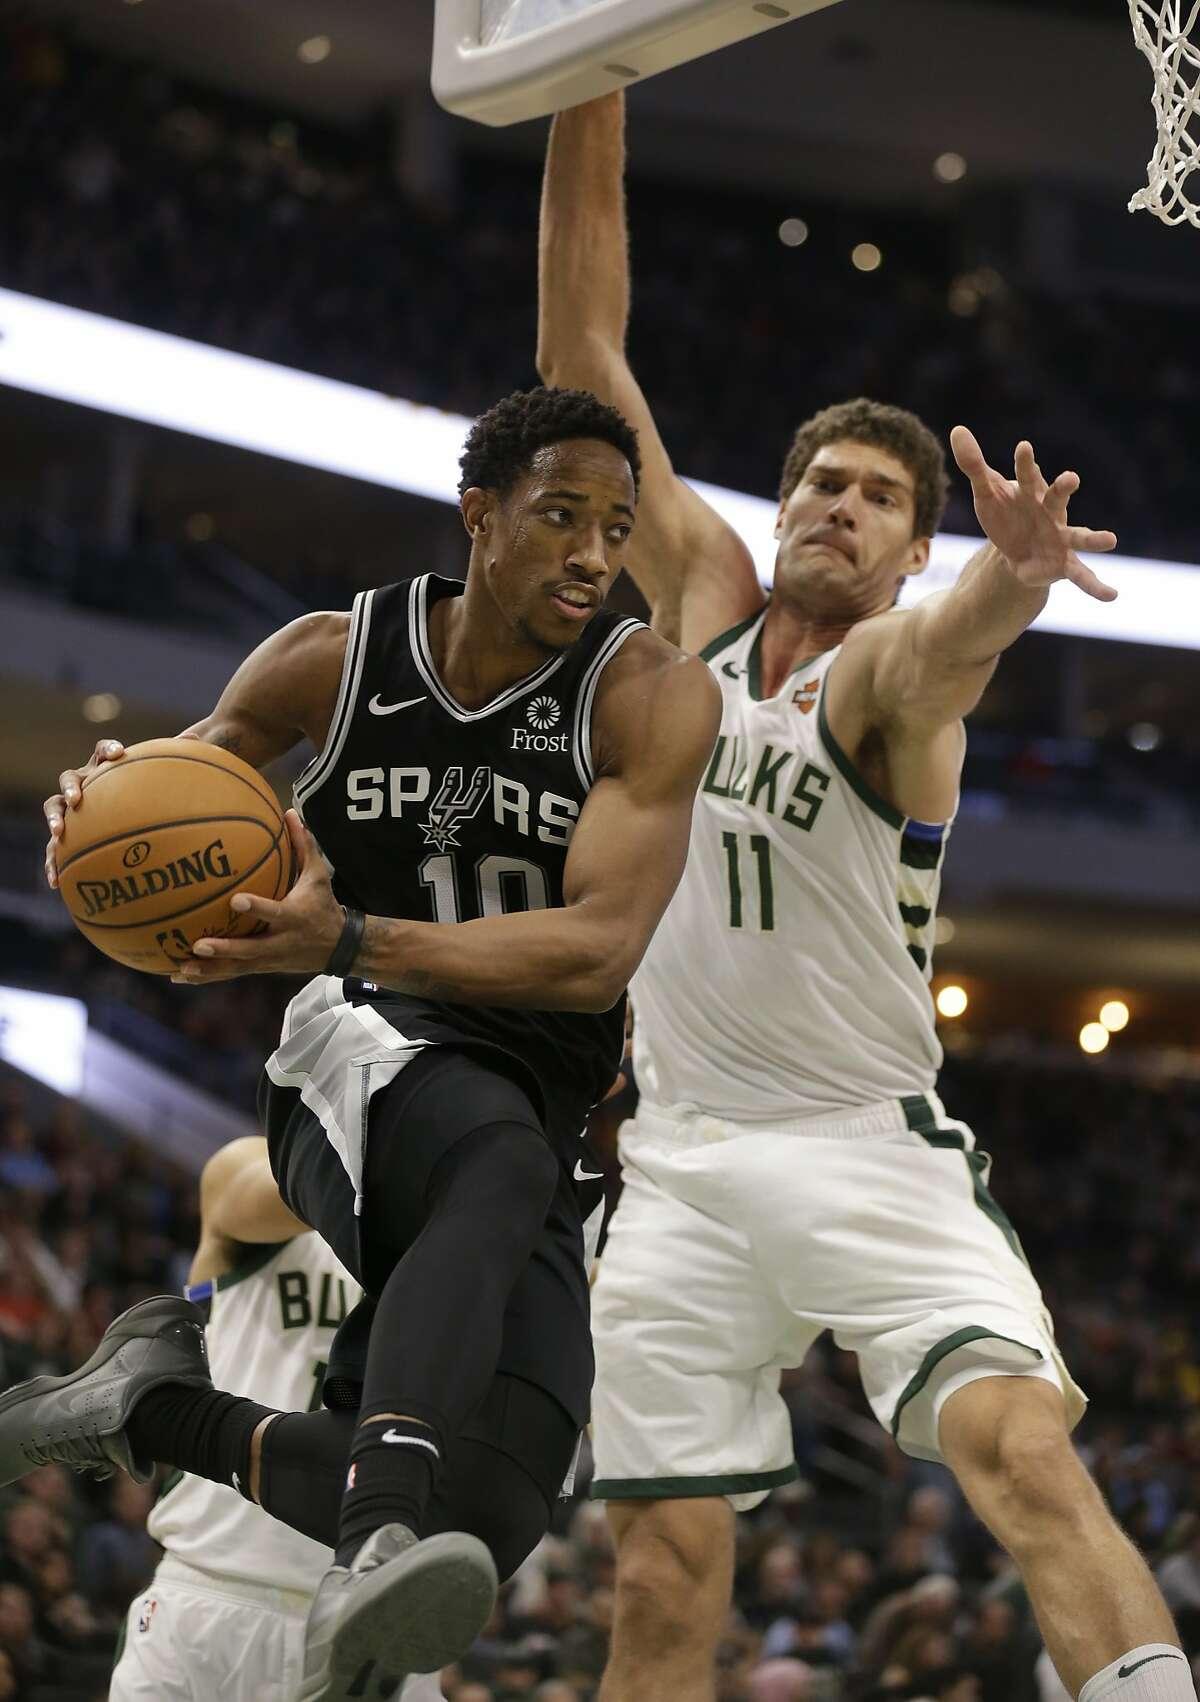 San Antonio Spurs' DeMar DeRozan(10) drives against the Milwaukee Bucks' Brook Lopez during the second half of an NBA basketball game Saturday, Nov. 24, 2018, in Milwaukee. The Bucks won, 135-129. (AP Photo/Jeffrey Phelps)